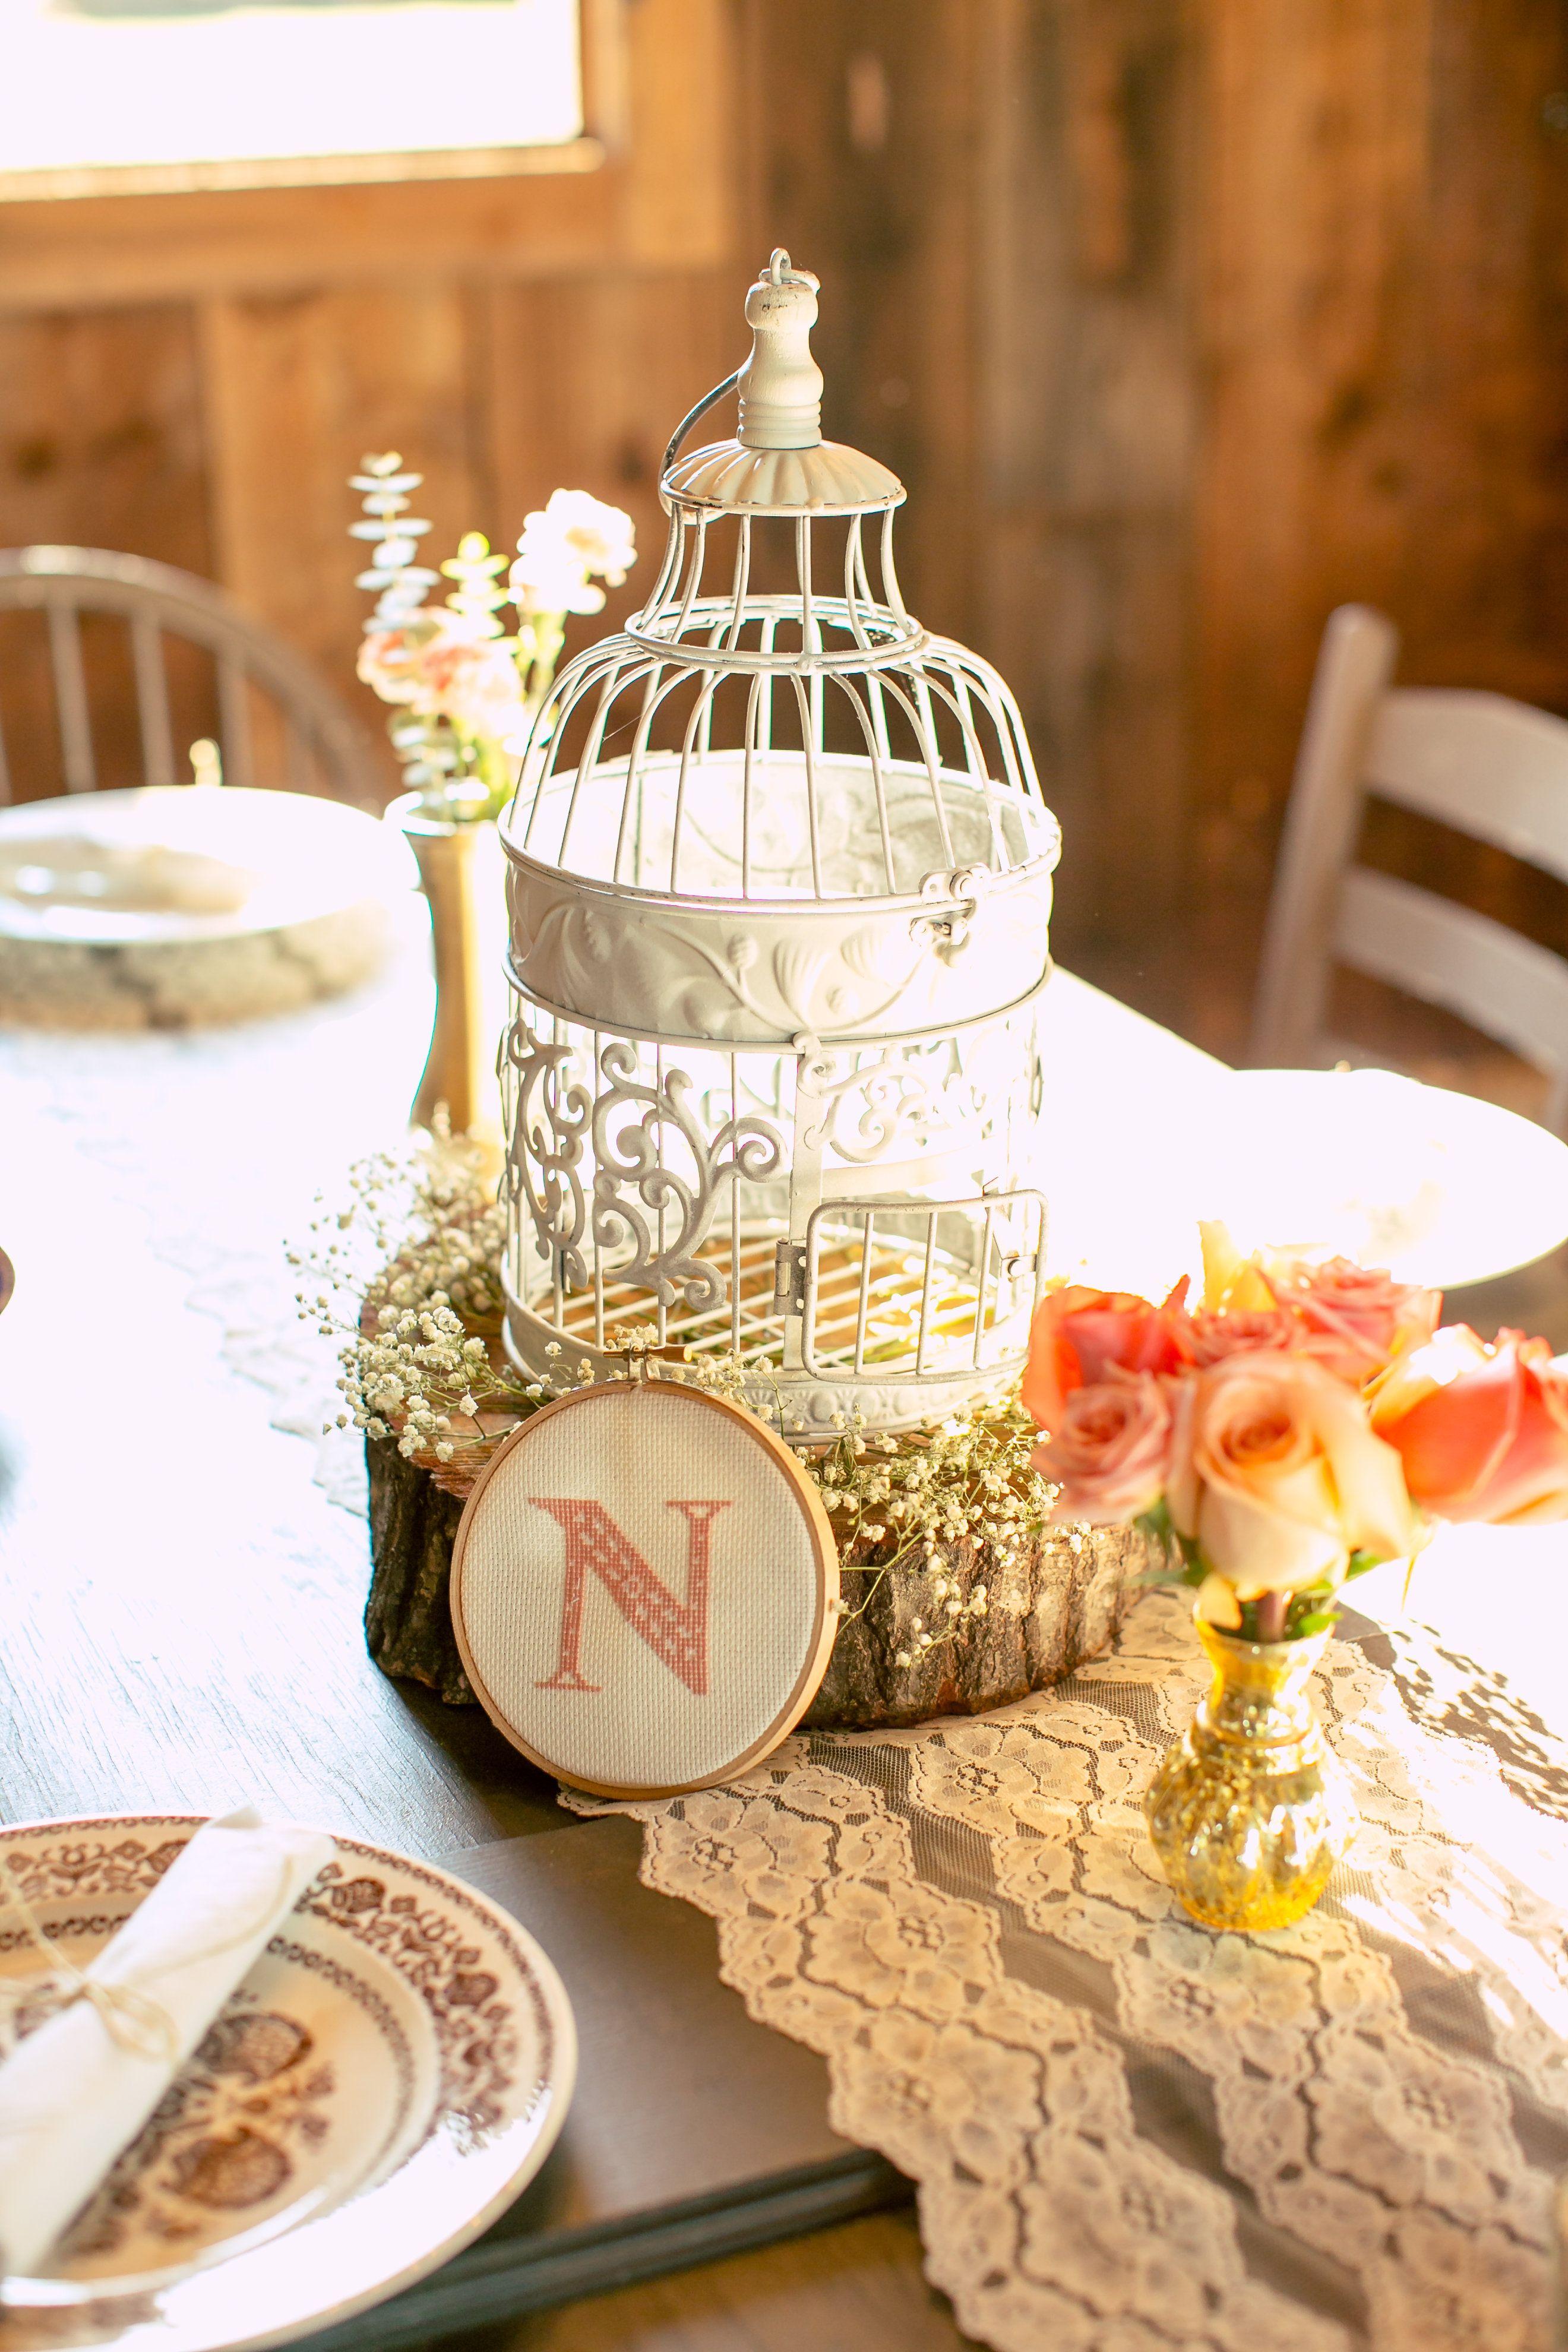 Wedding decor images  Pin by Natalia Ferrando on Wedding Decor  Pinterest